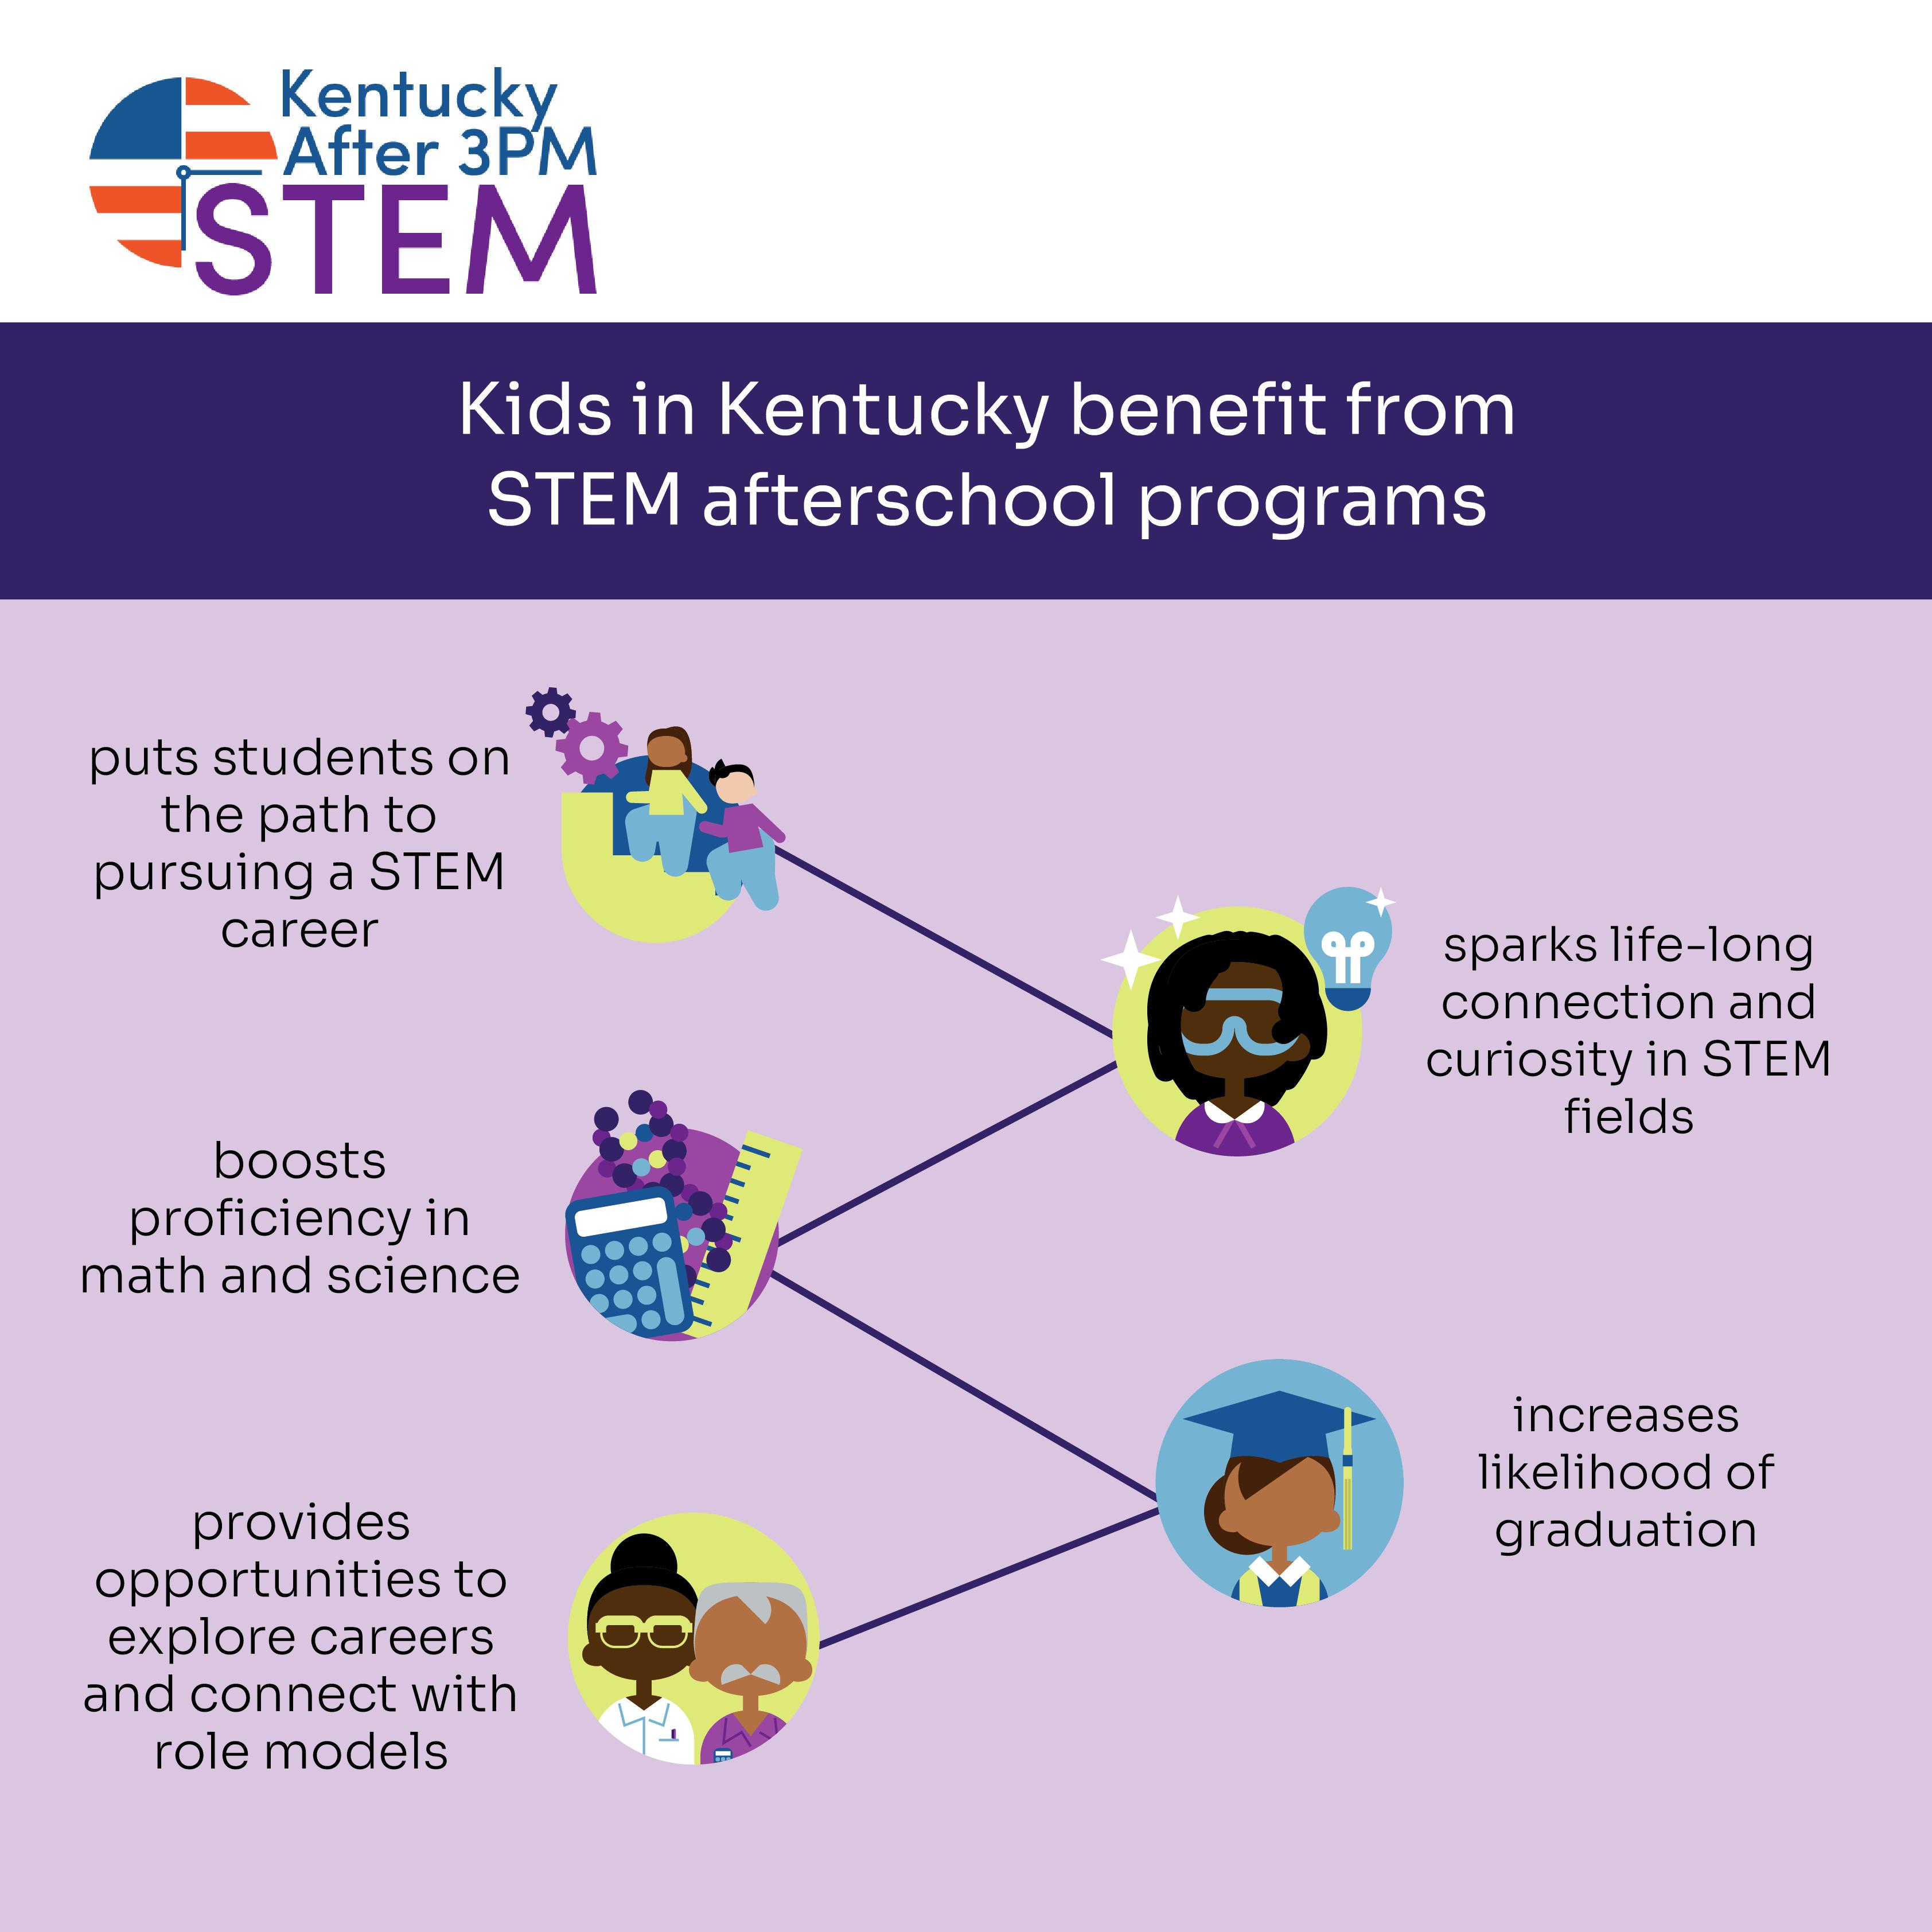 STEMSocialGraphics Kentucky KY KidsBenefitfromSTEM